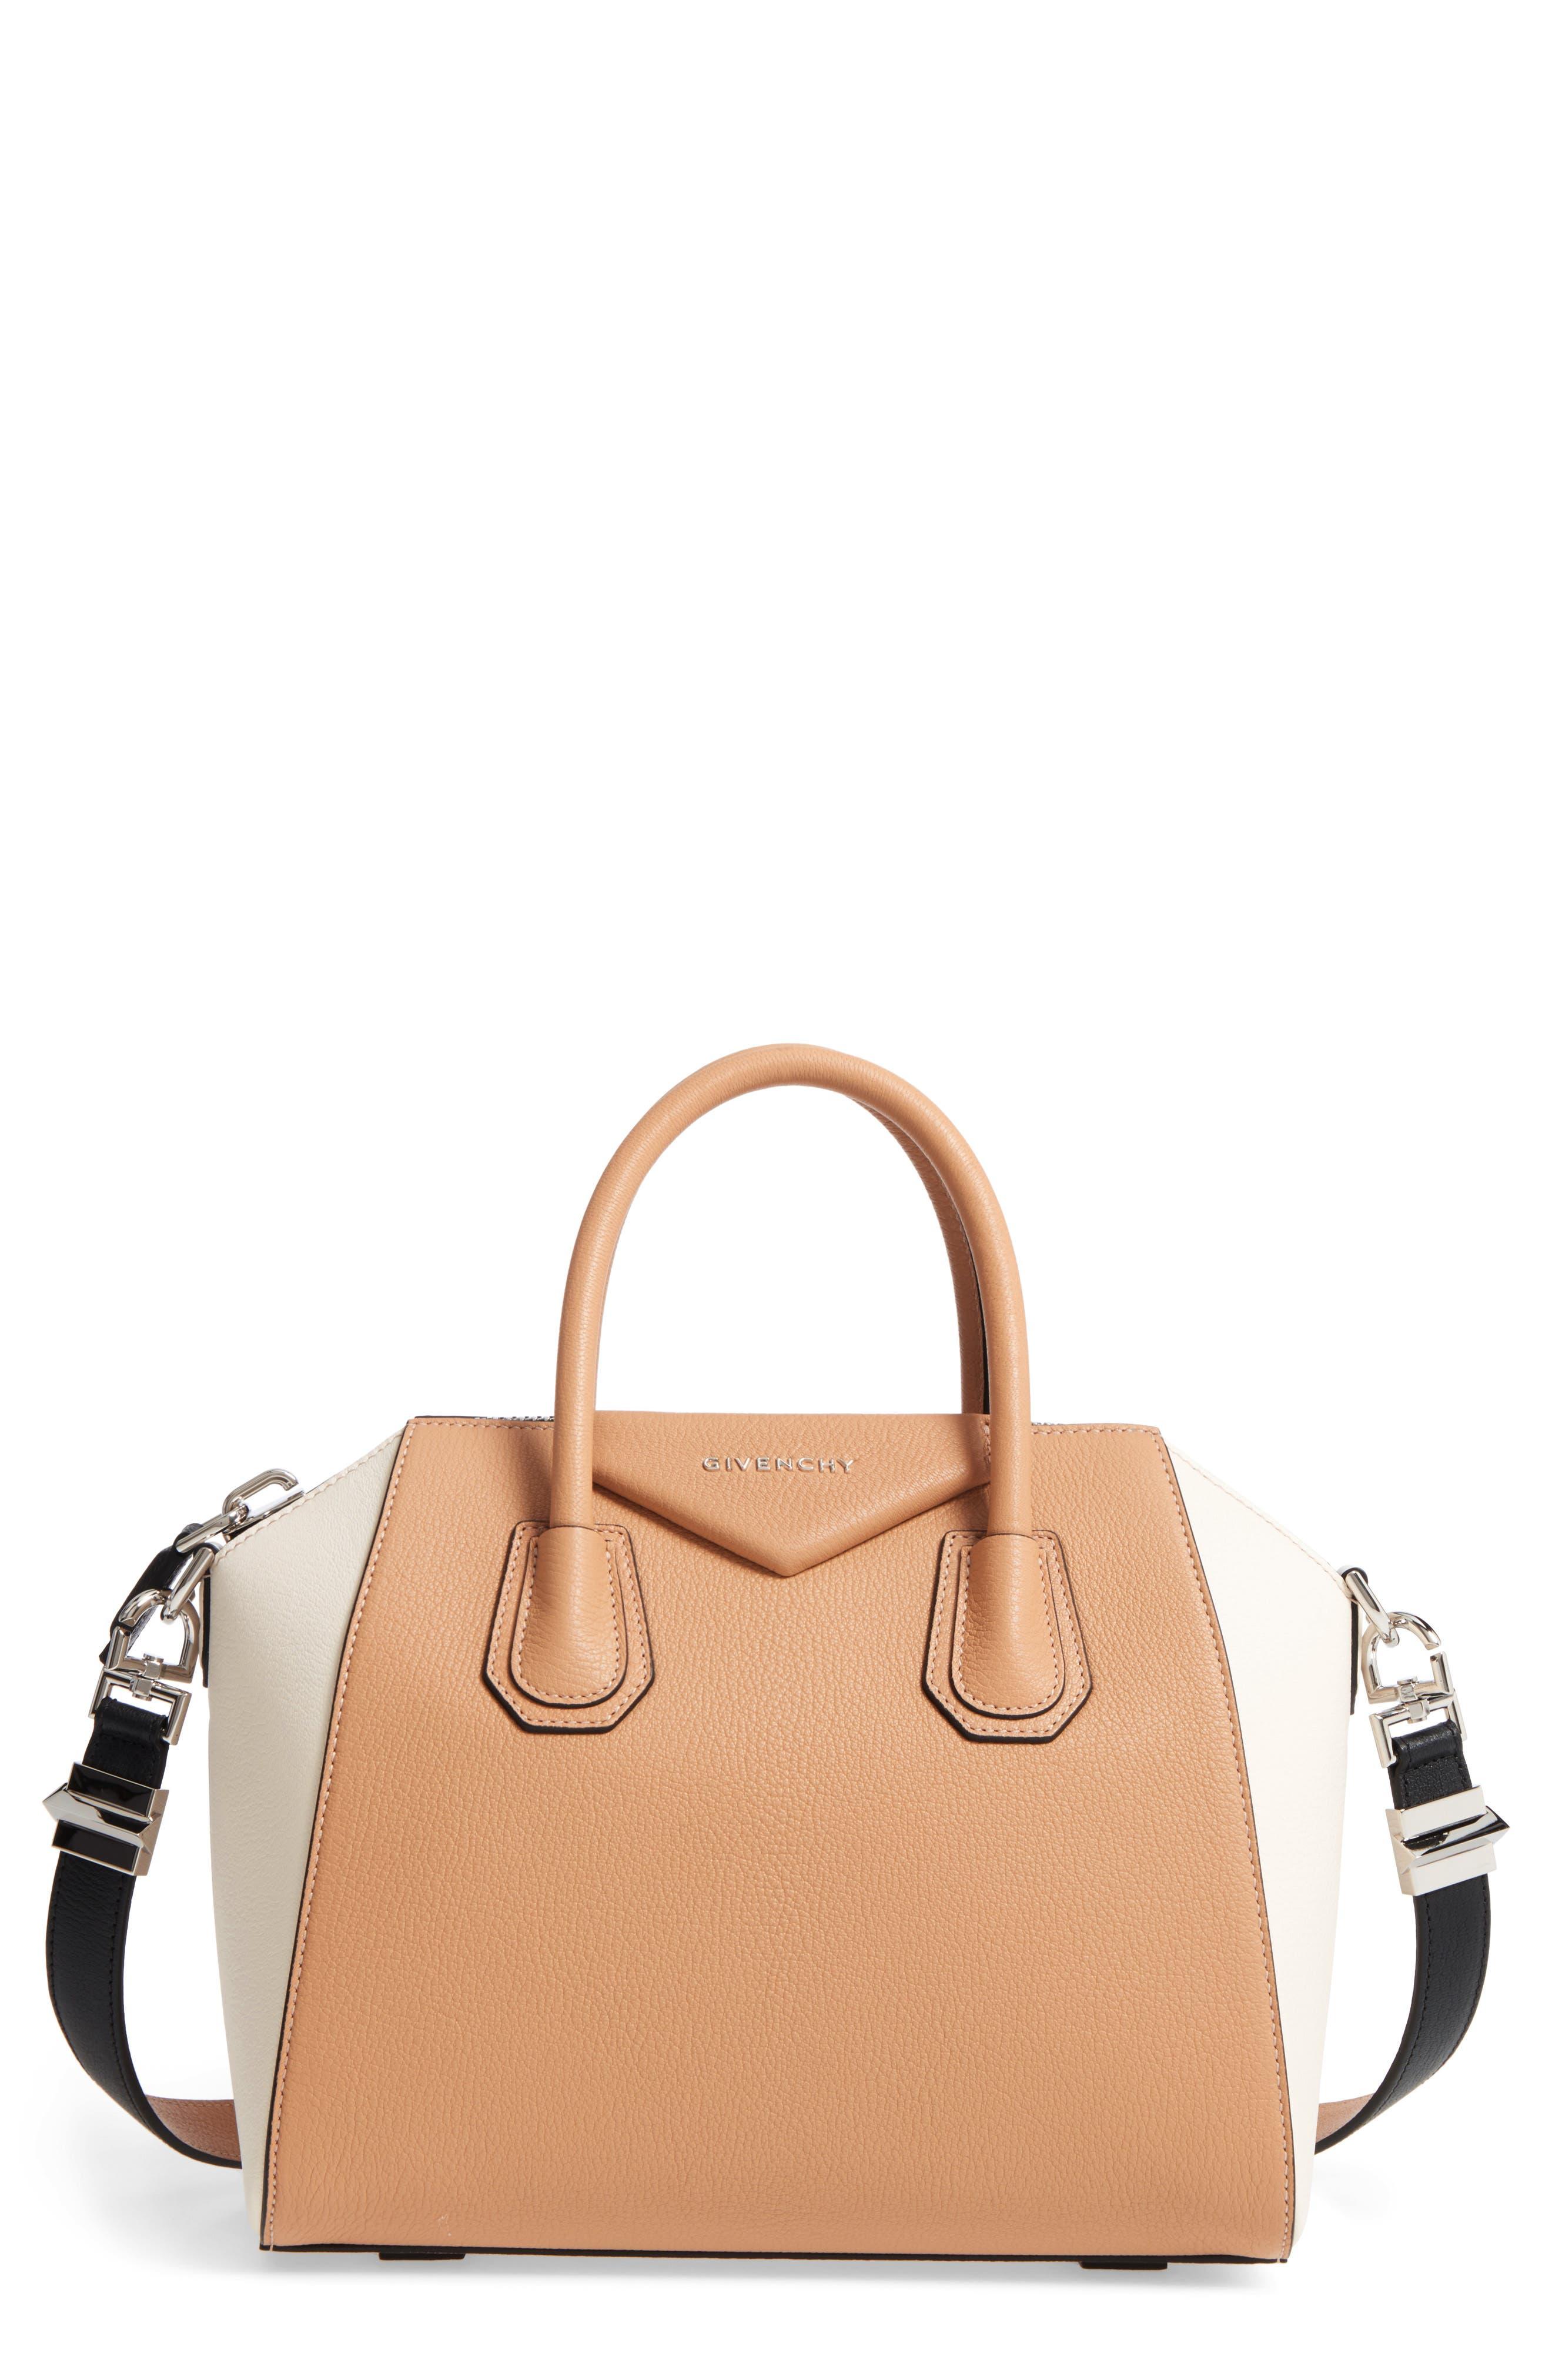 Givenchy Medium Antigona Bicolor Sugar Leather Satchel